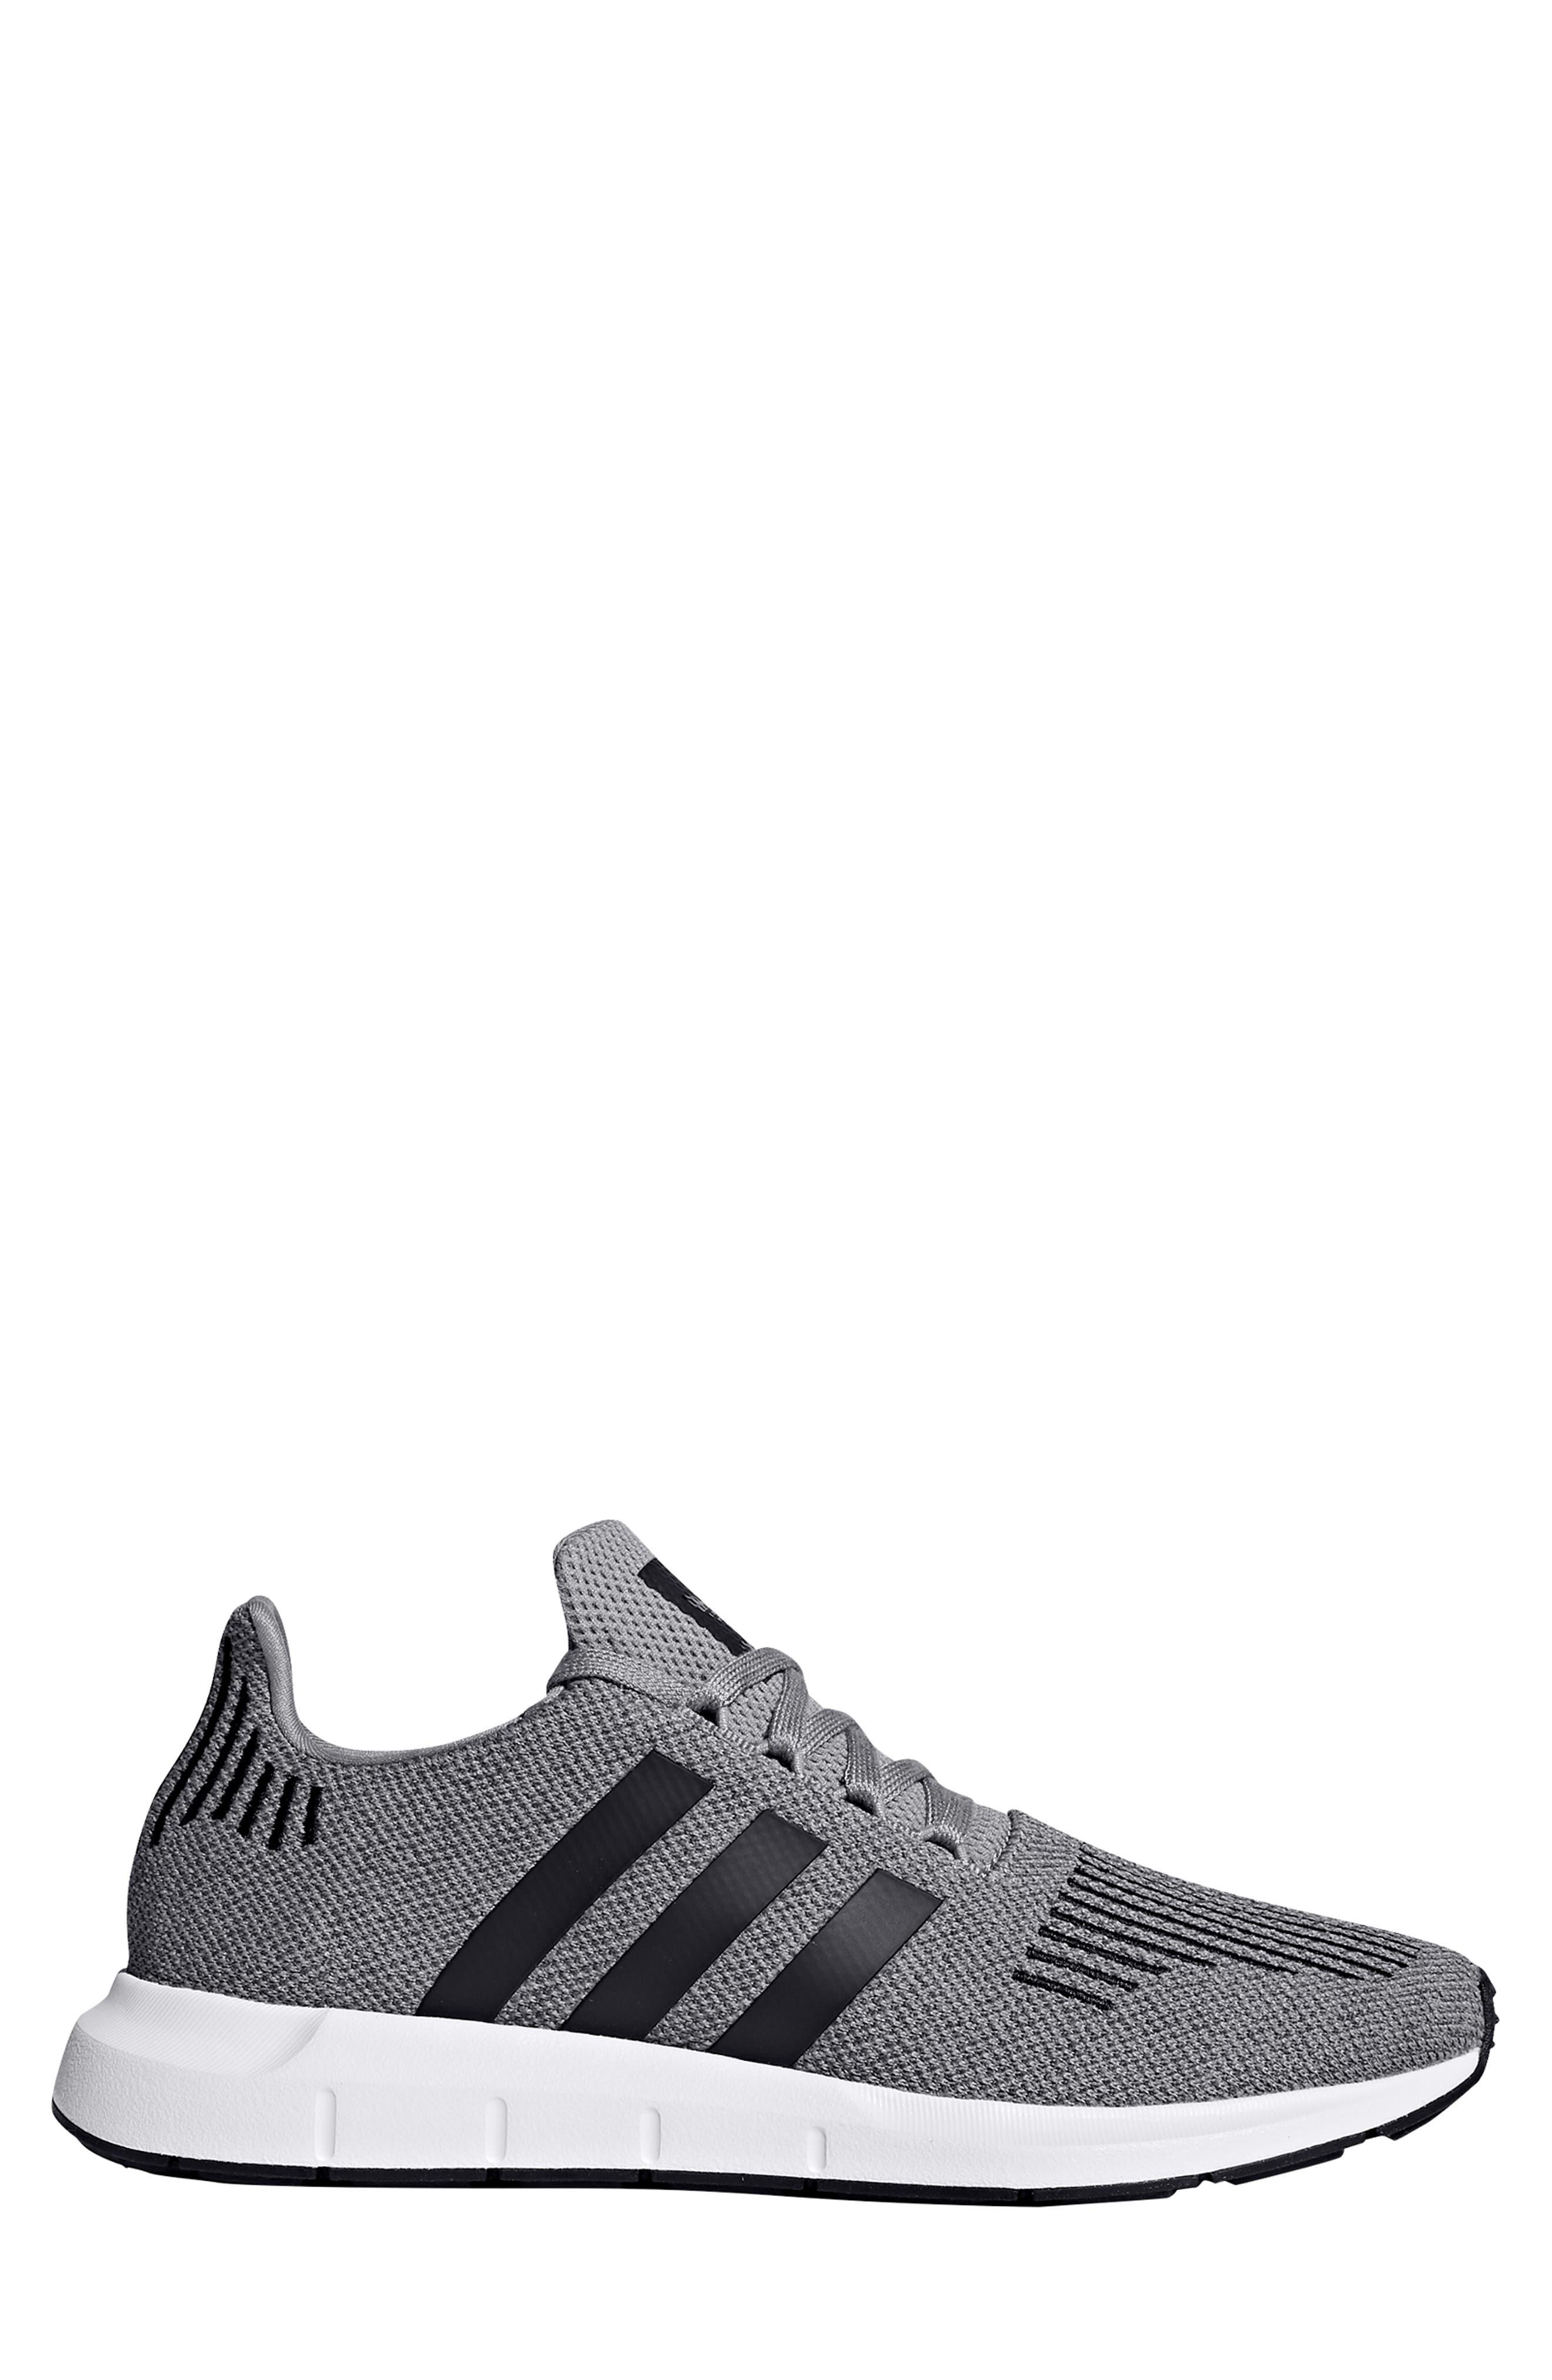 Swift Run Running Shoe,                             Main thumbnail 1, color,                             Grey/ Black/ Medium Grey